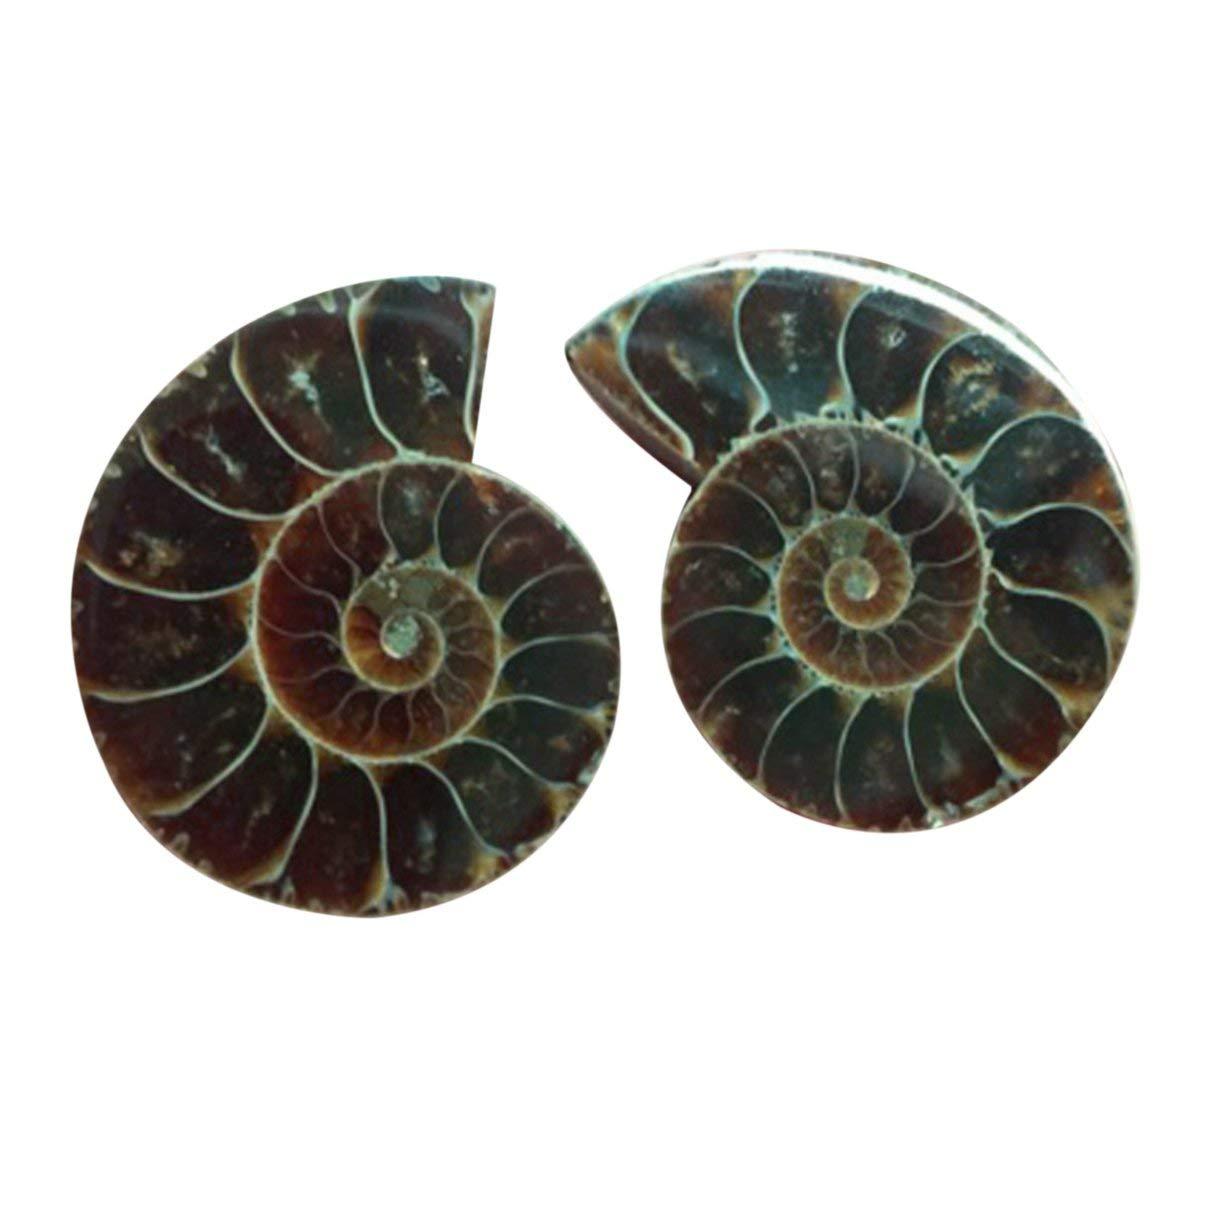 SaraHew74 1 Par Natural Amonita Esp/écimen F/ósil Concha Concha F/ósil Nautilus Oc/éano Jaspe Fish Tank Piedras Ornamento Decorativo